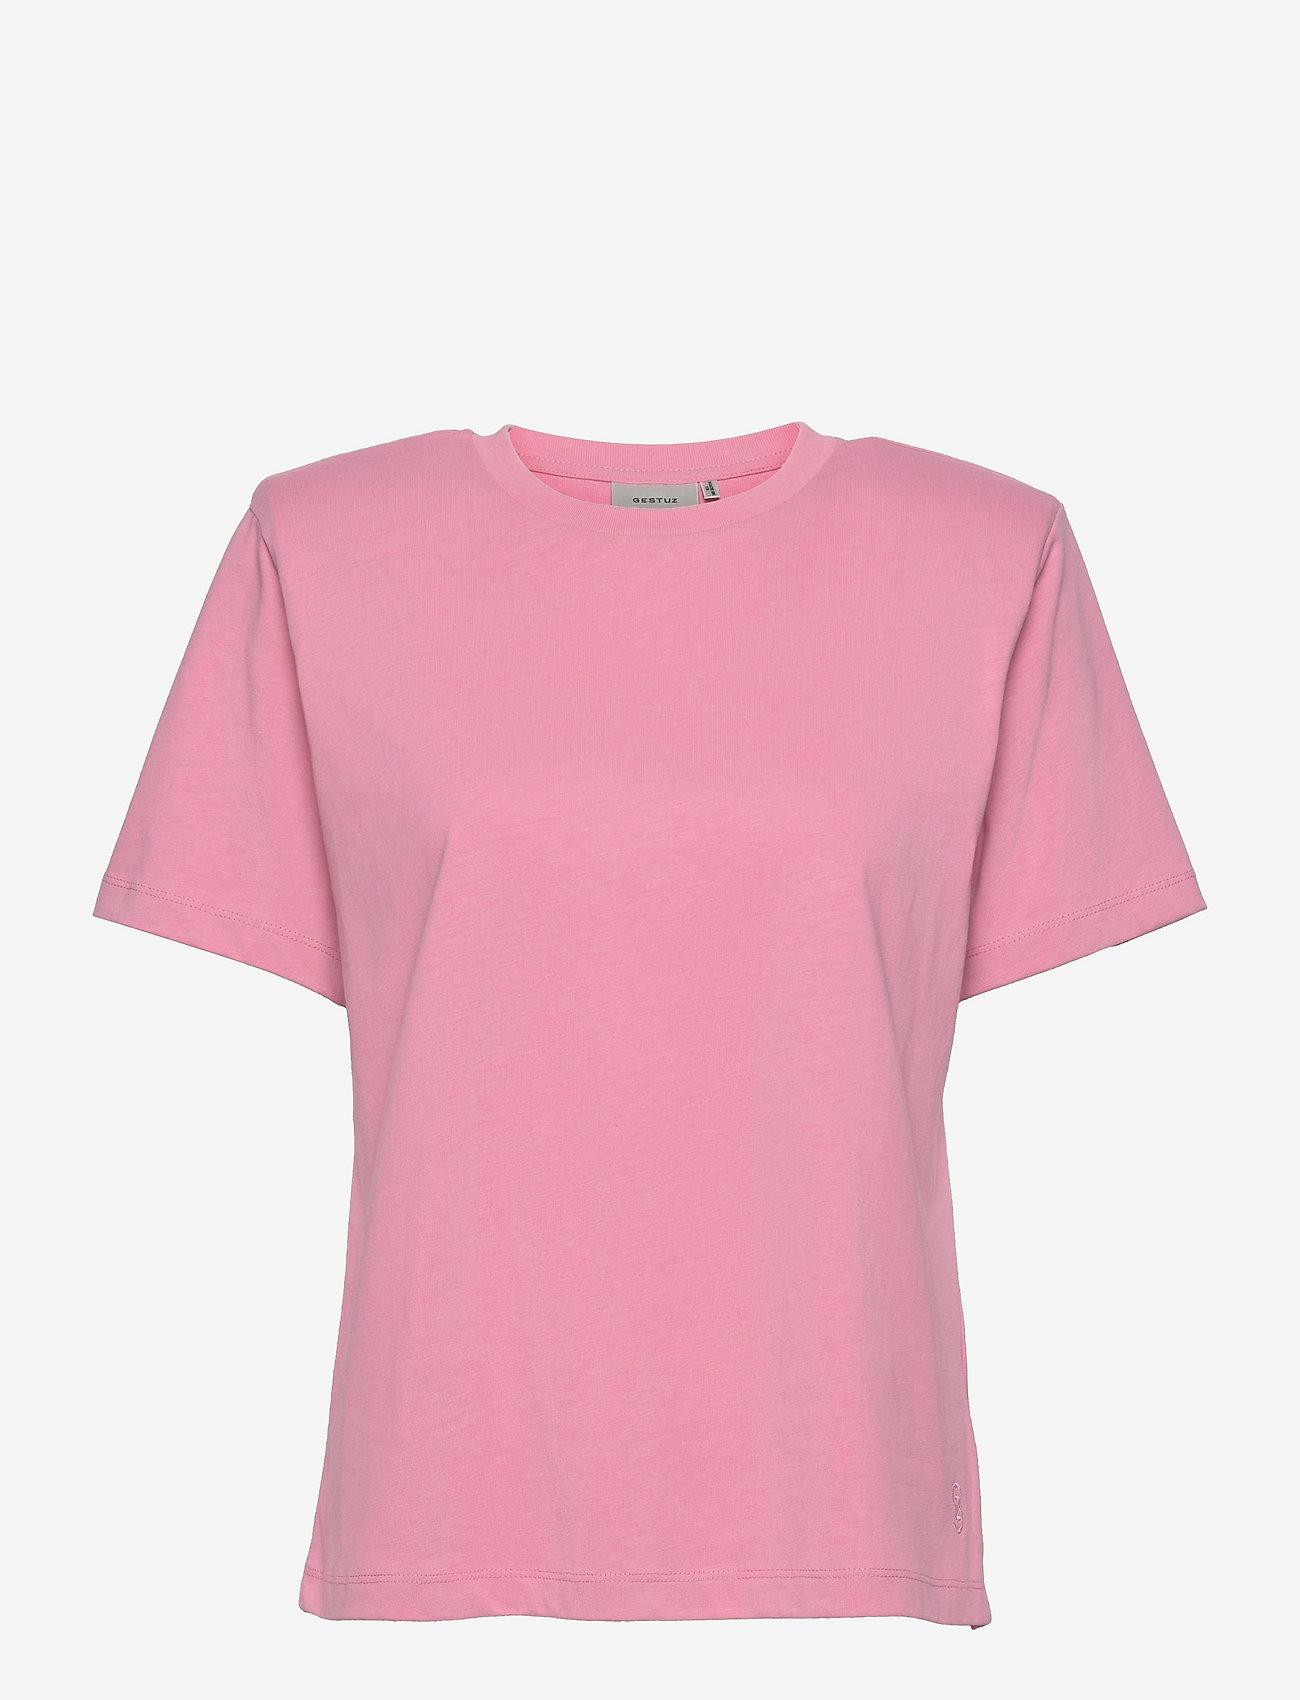 Gestuz - JoryGZ tee - t-shirts - cashmere rose - 0